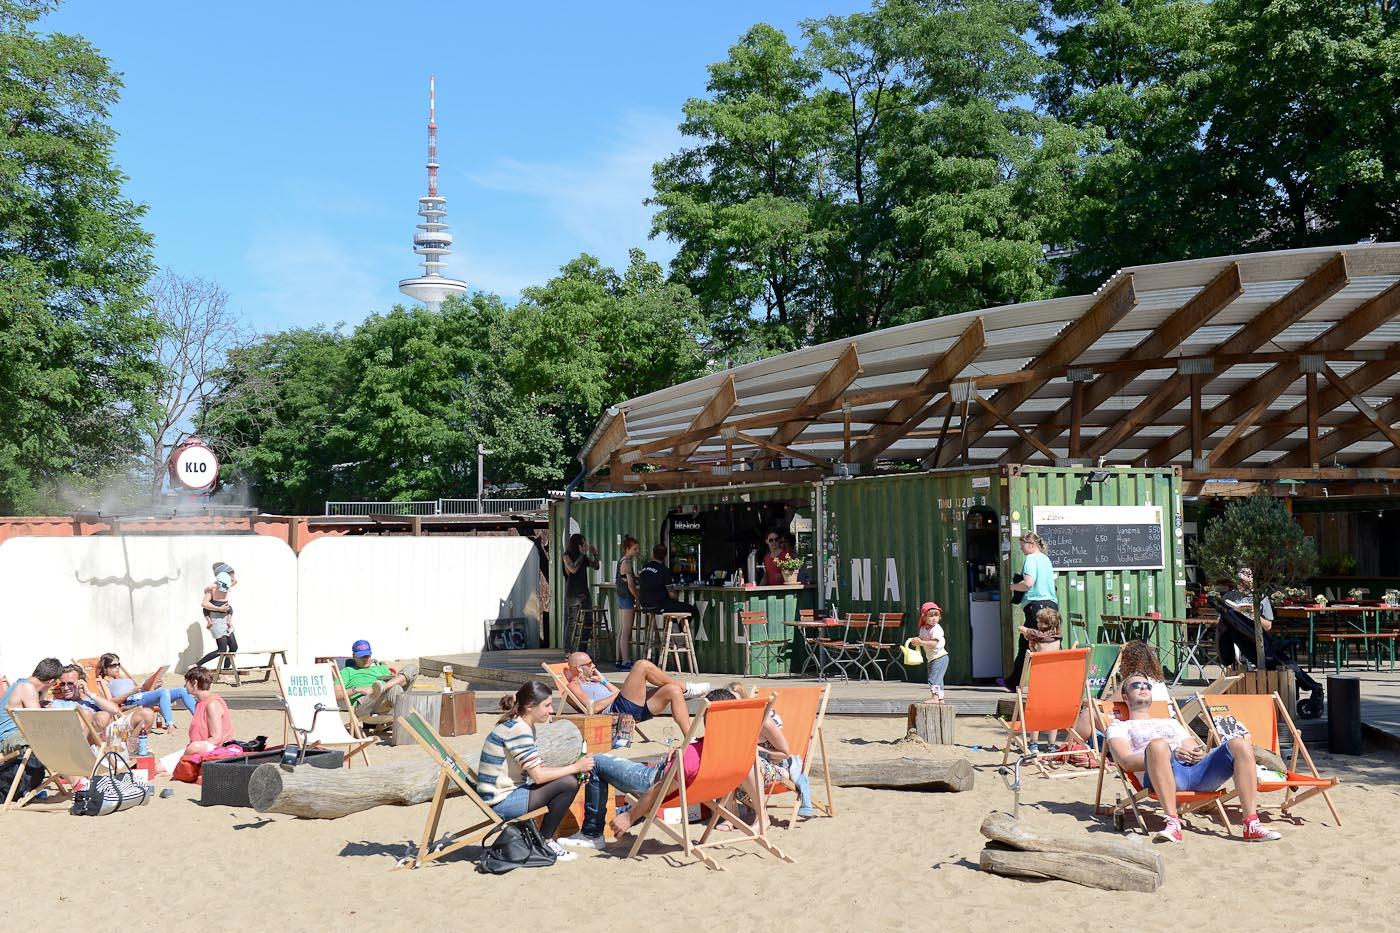 Foto-ID 15072203 - Central-Park, Max-Brauer-Allee 277, 22769 Hamburg